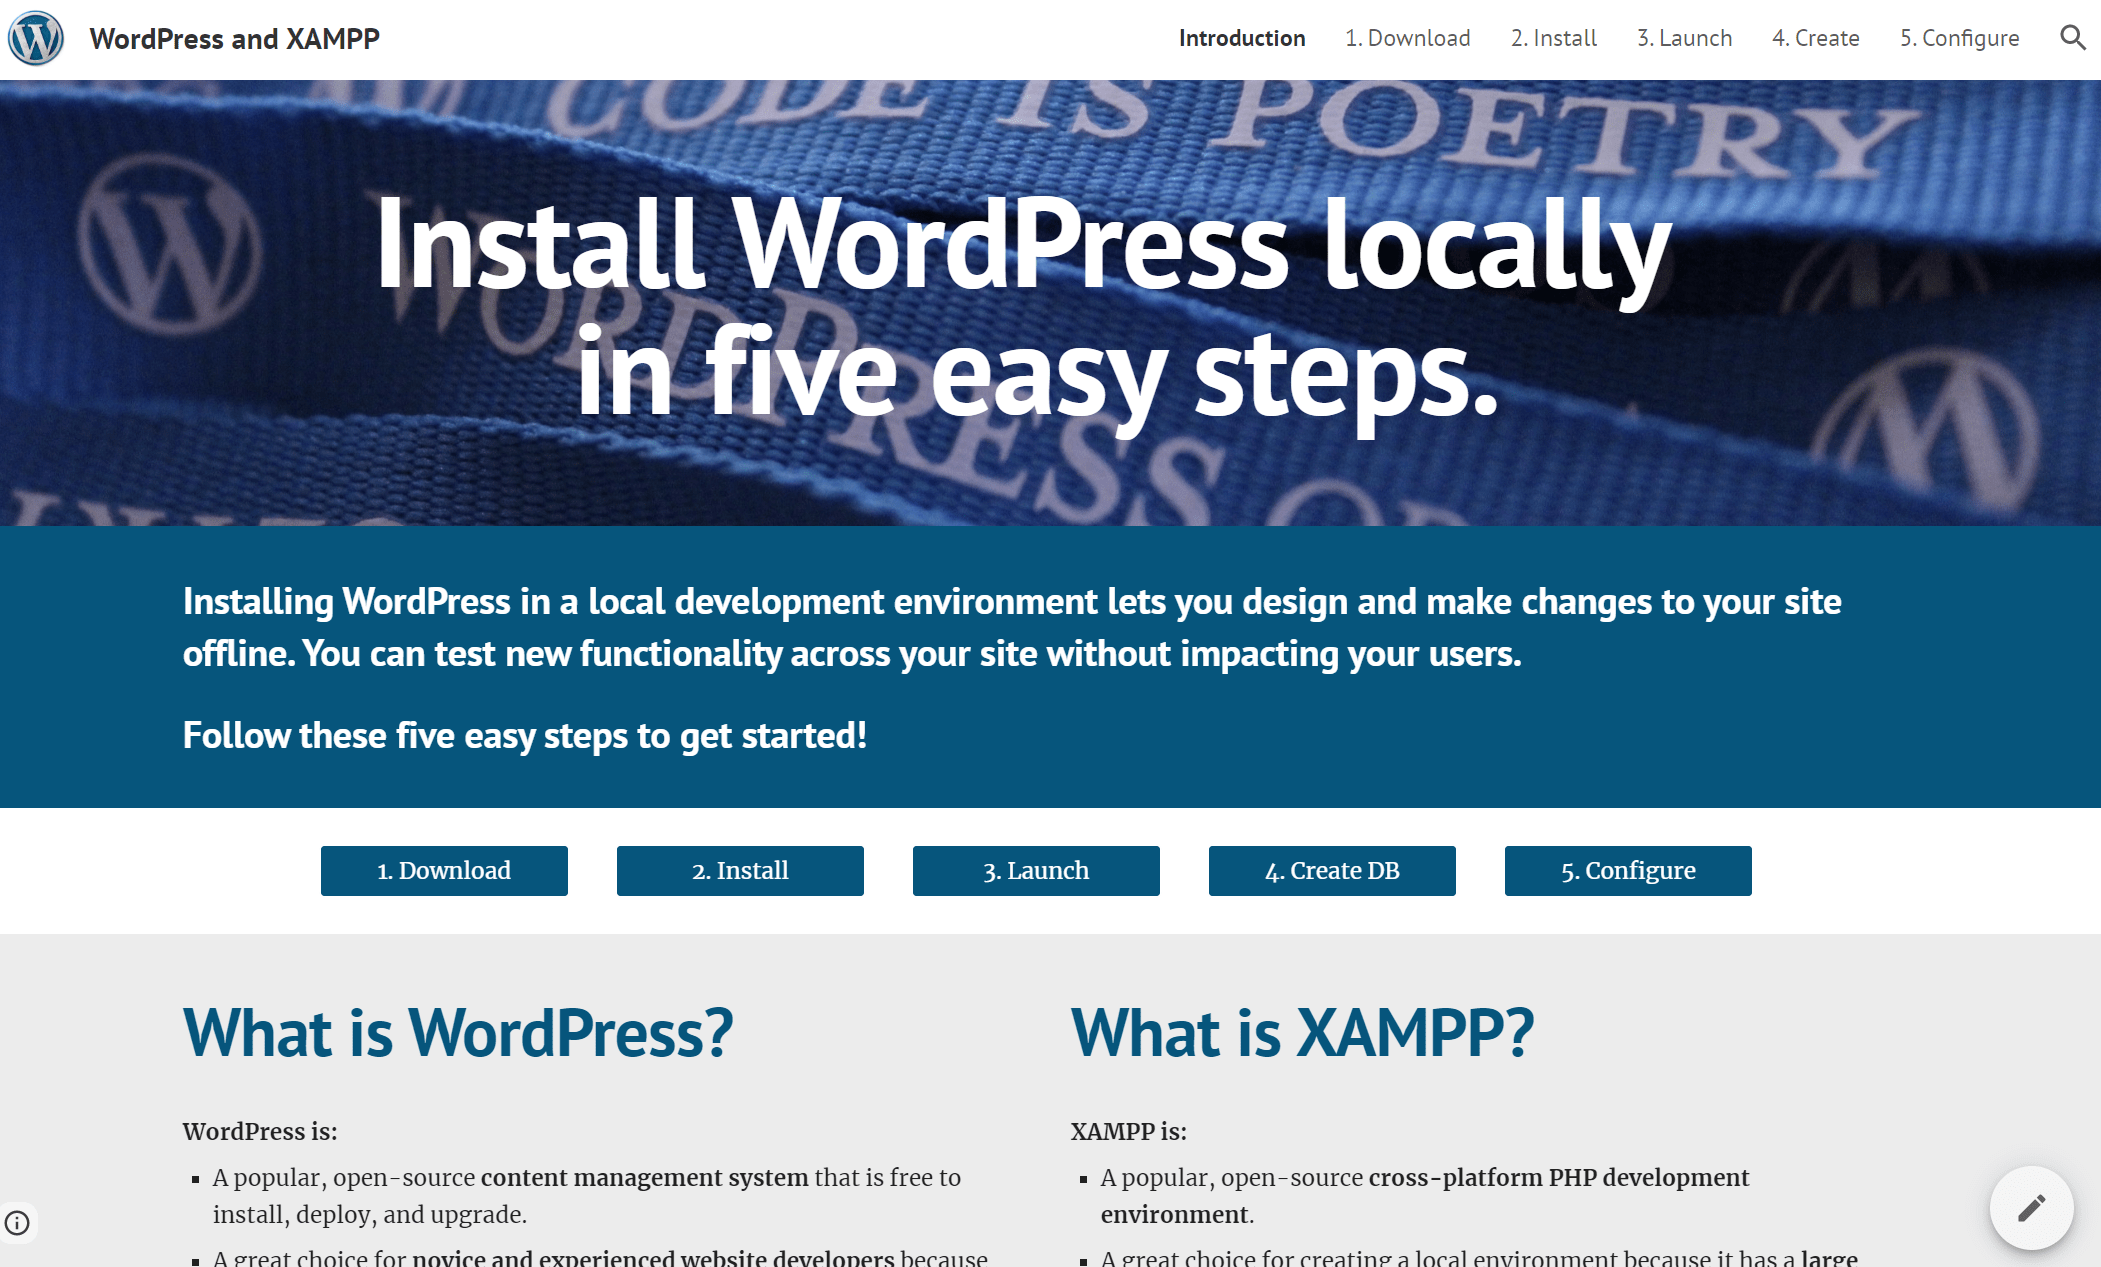 wordpress xampp site